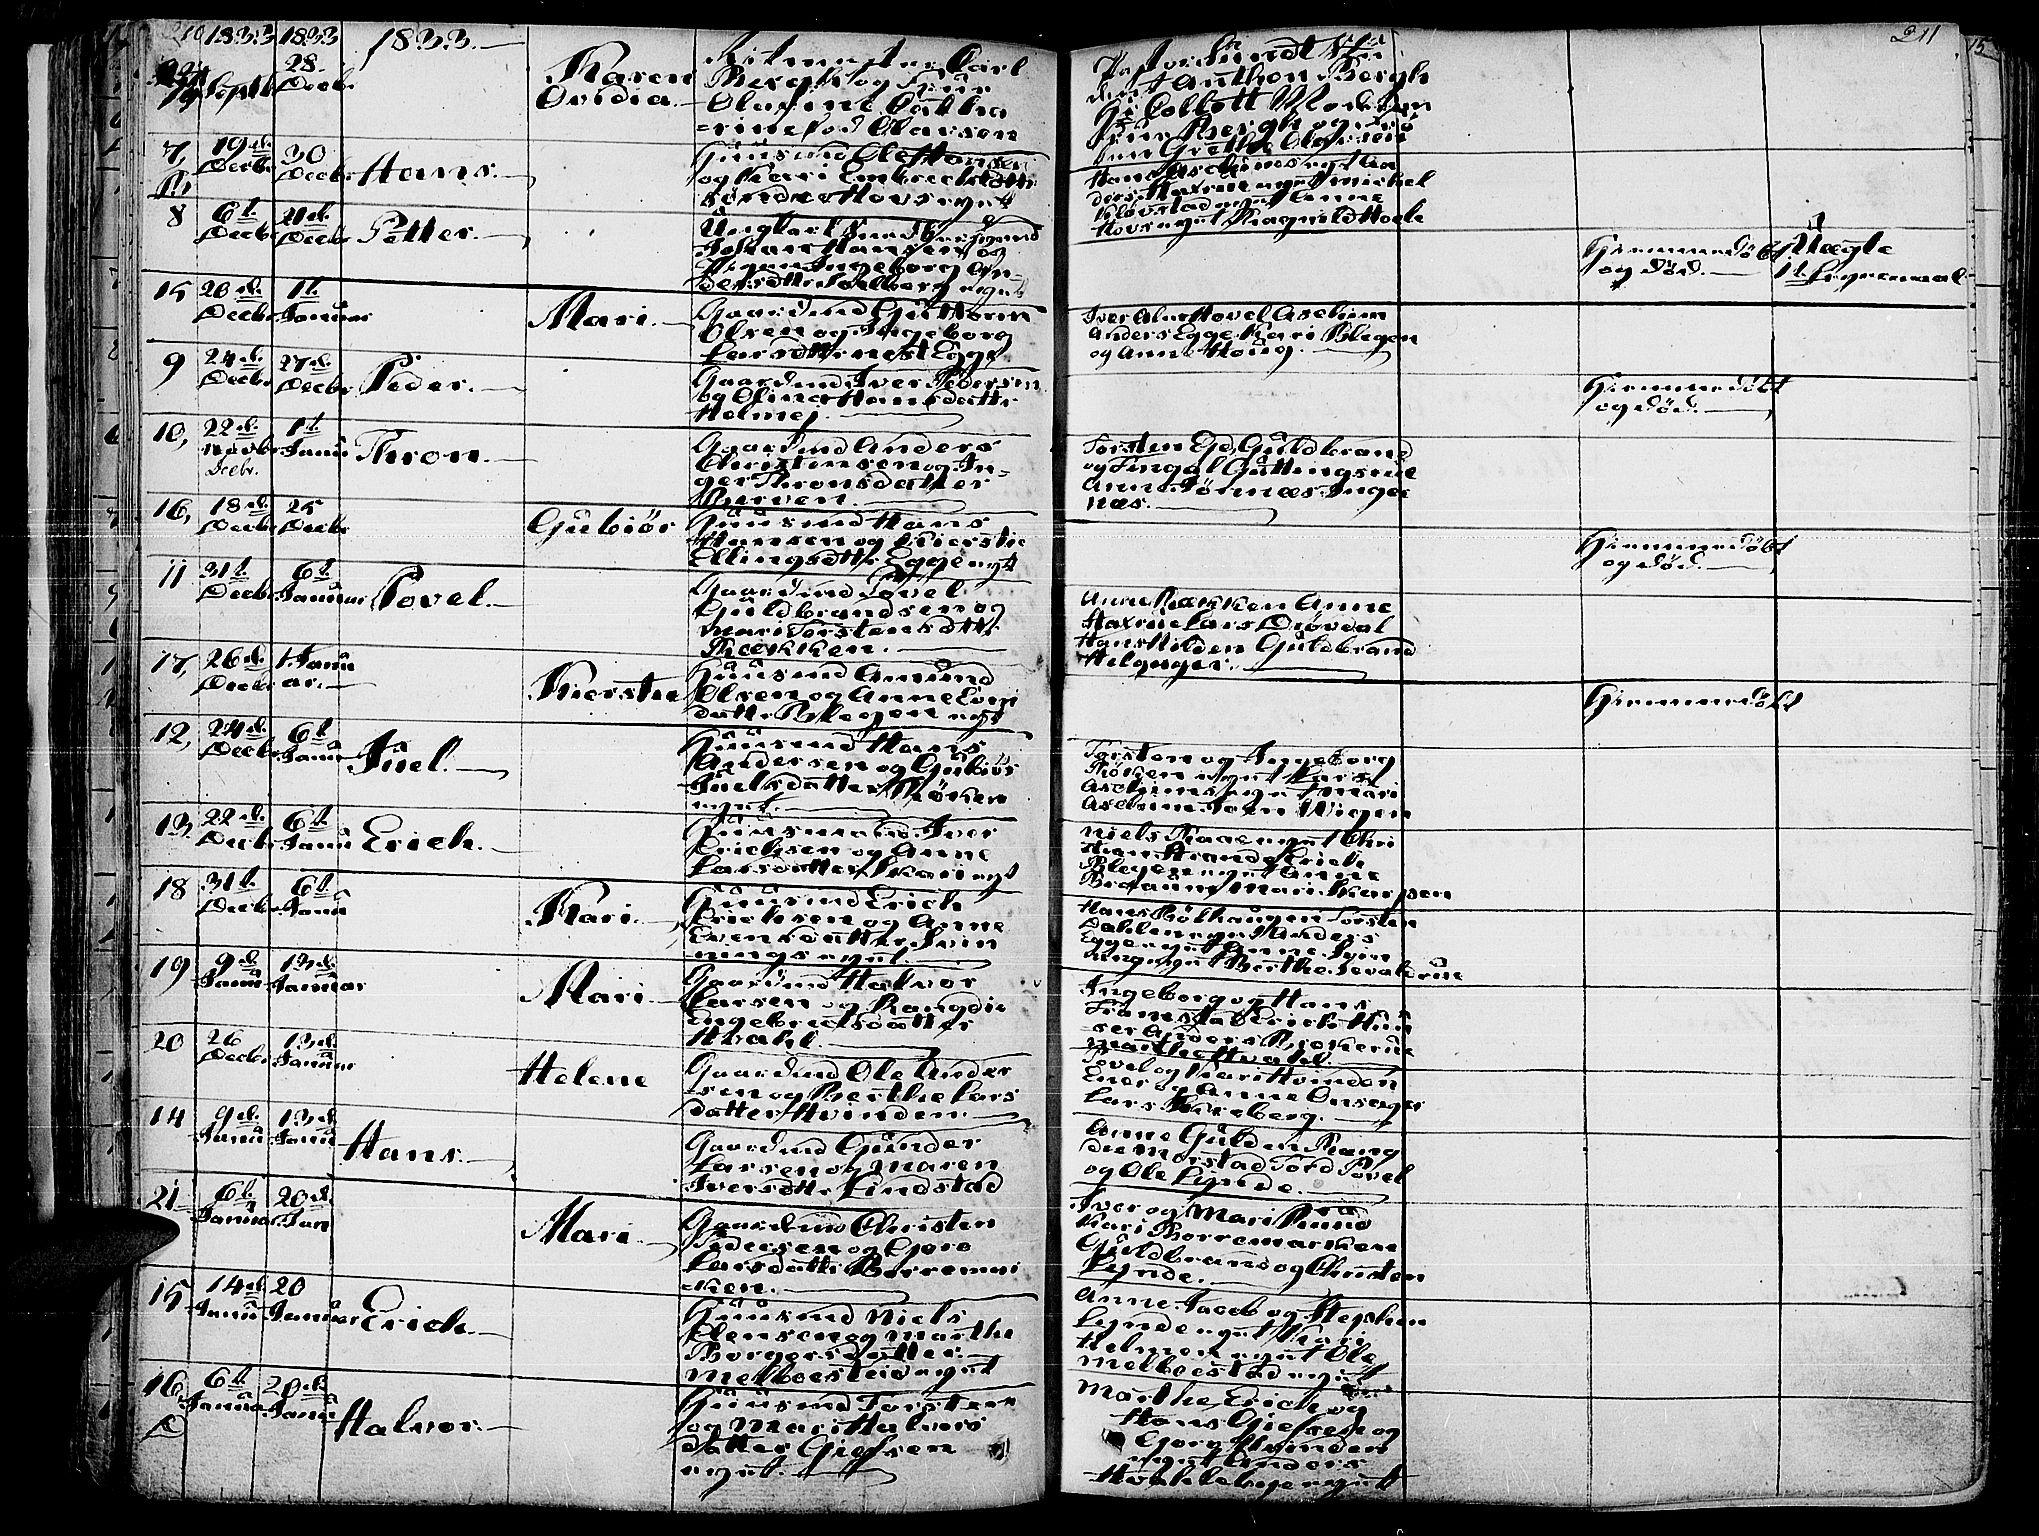 SAH, Gran prestekontor, Parish register (official) no. 10, 1824-1842, p. 210-211